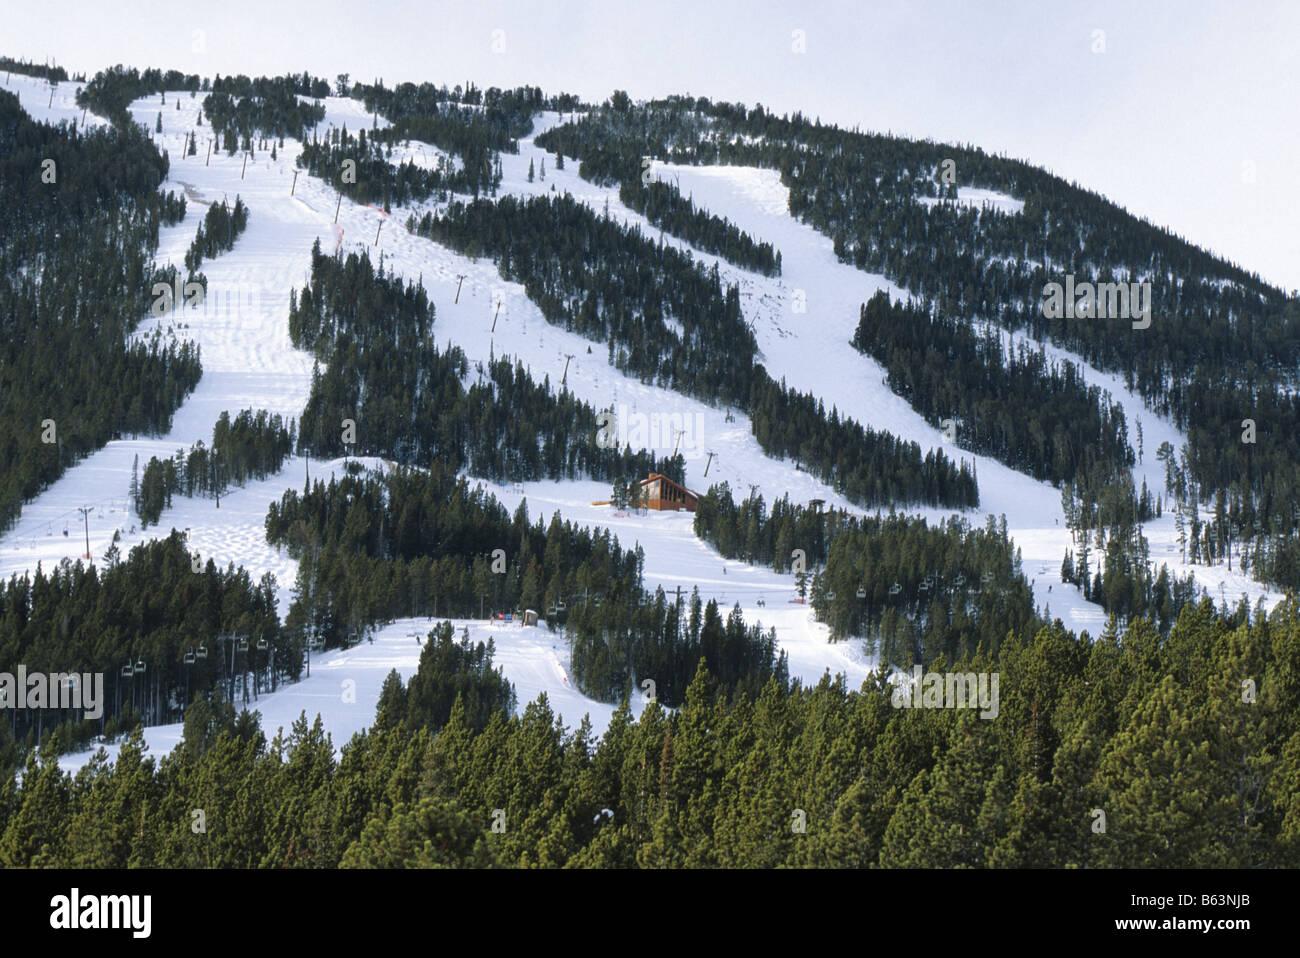 red lodge mountain resort ski area in montana usa stock photo